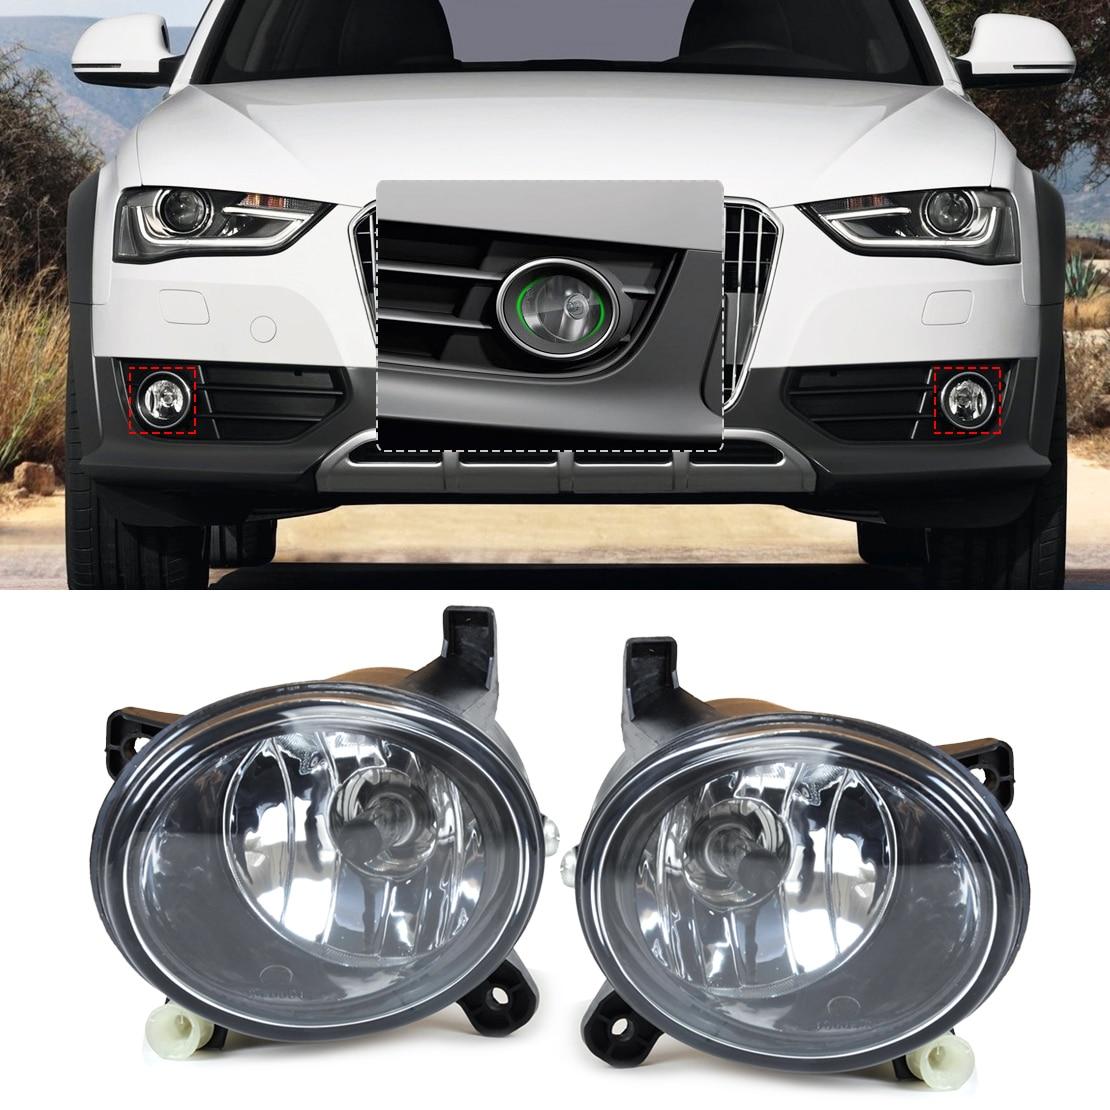 DWCX 8T0941699B, 8T0941700B Front Right Left Fog Light Lamp for for Audi A4 B8 / S4 / A4 Allroad / A6 C6 / S6 / A5 / S5 / Q5 1pcs t10 6smd error free front side maker light parking light lamp bulb for audi a2 8l 8p a4 a6 4b 4f a8 d2 tt q3 q5 c5 c6 c7 s4